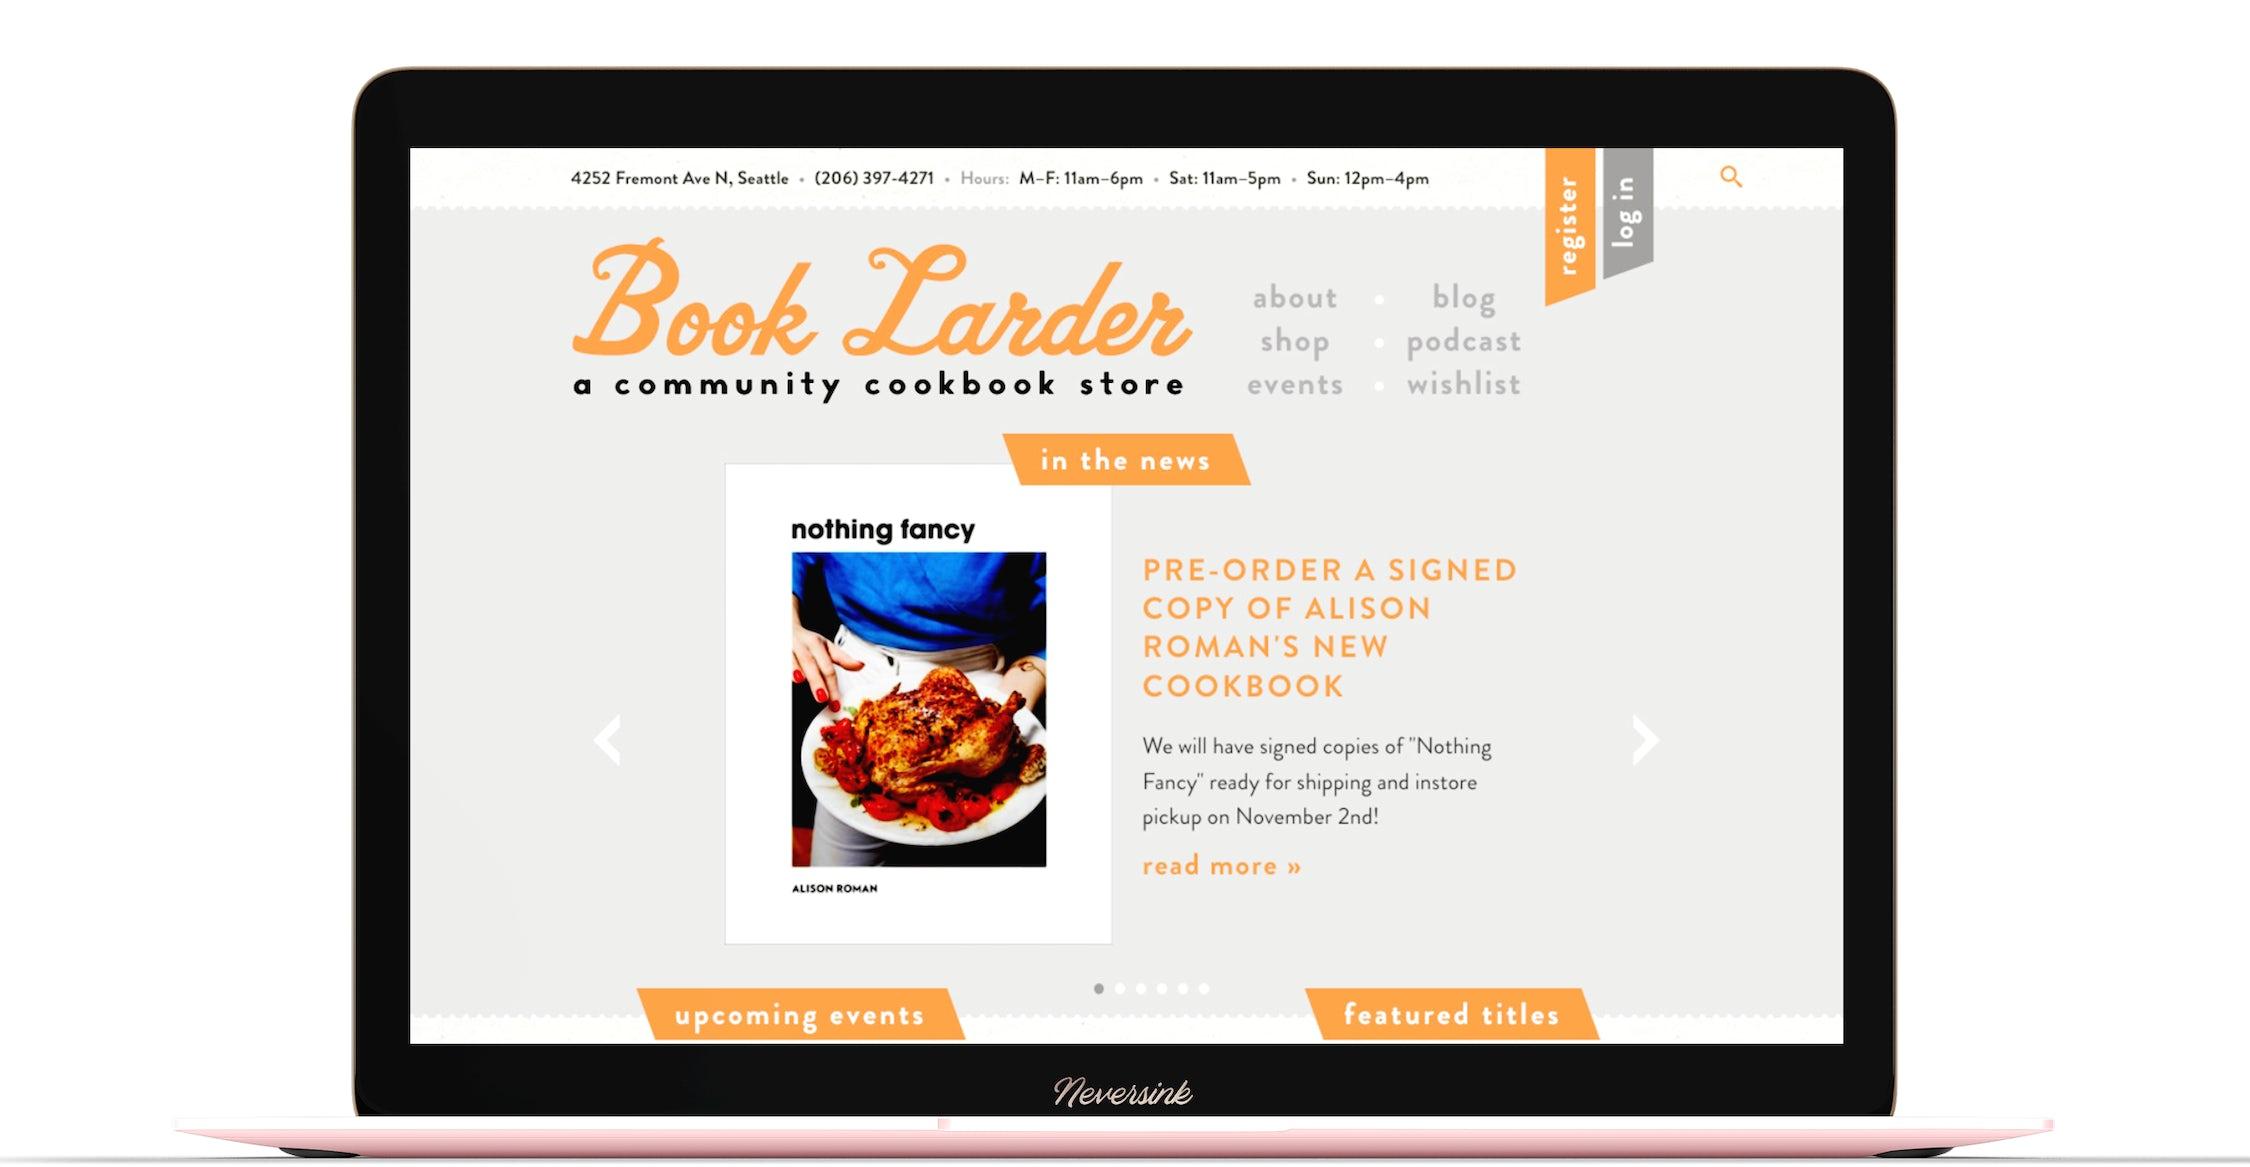 Book Larder Macbook